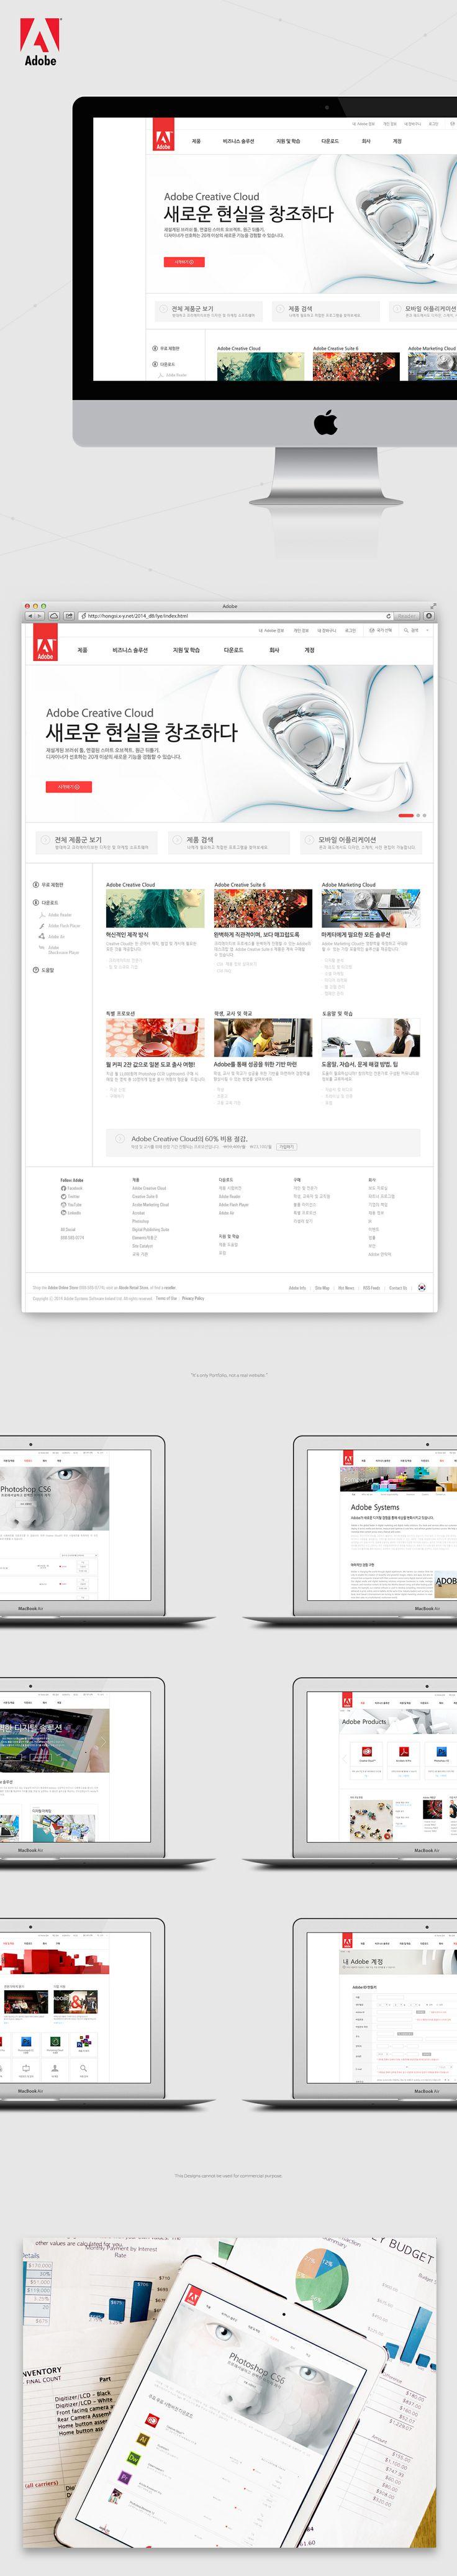 Web Design - Adobe Systems 웹사이트 리디자인 프로젝트